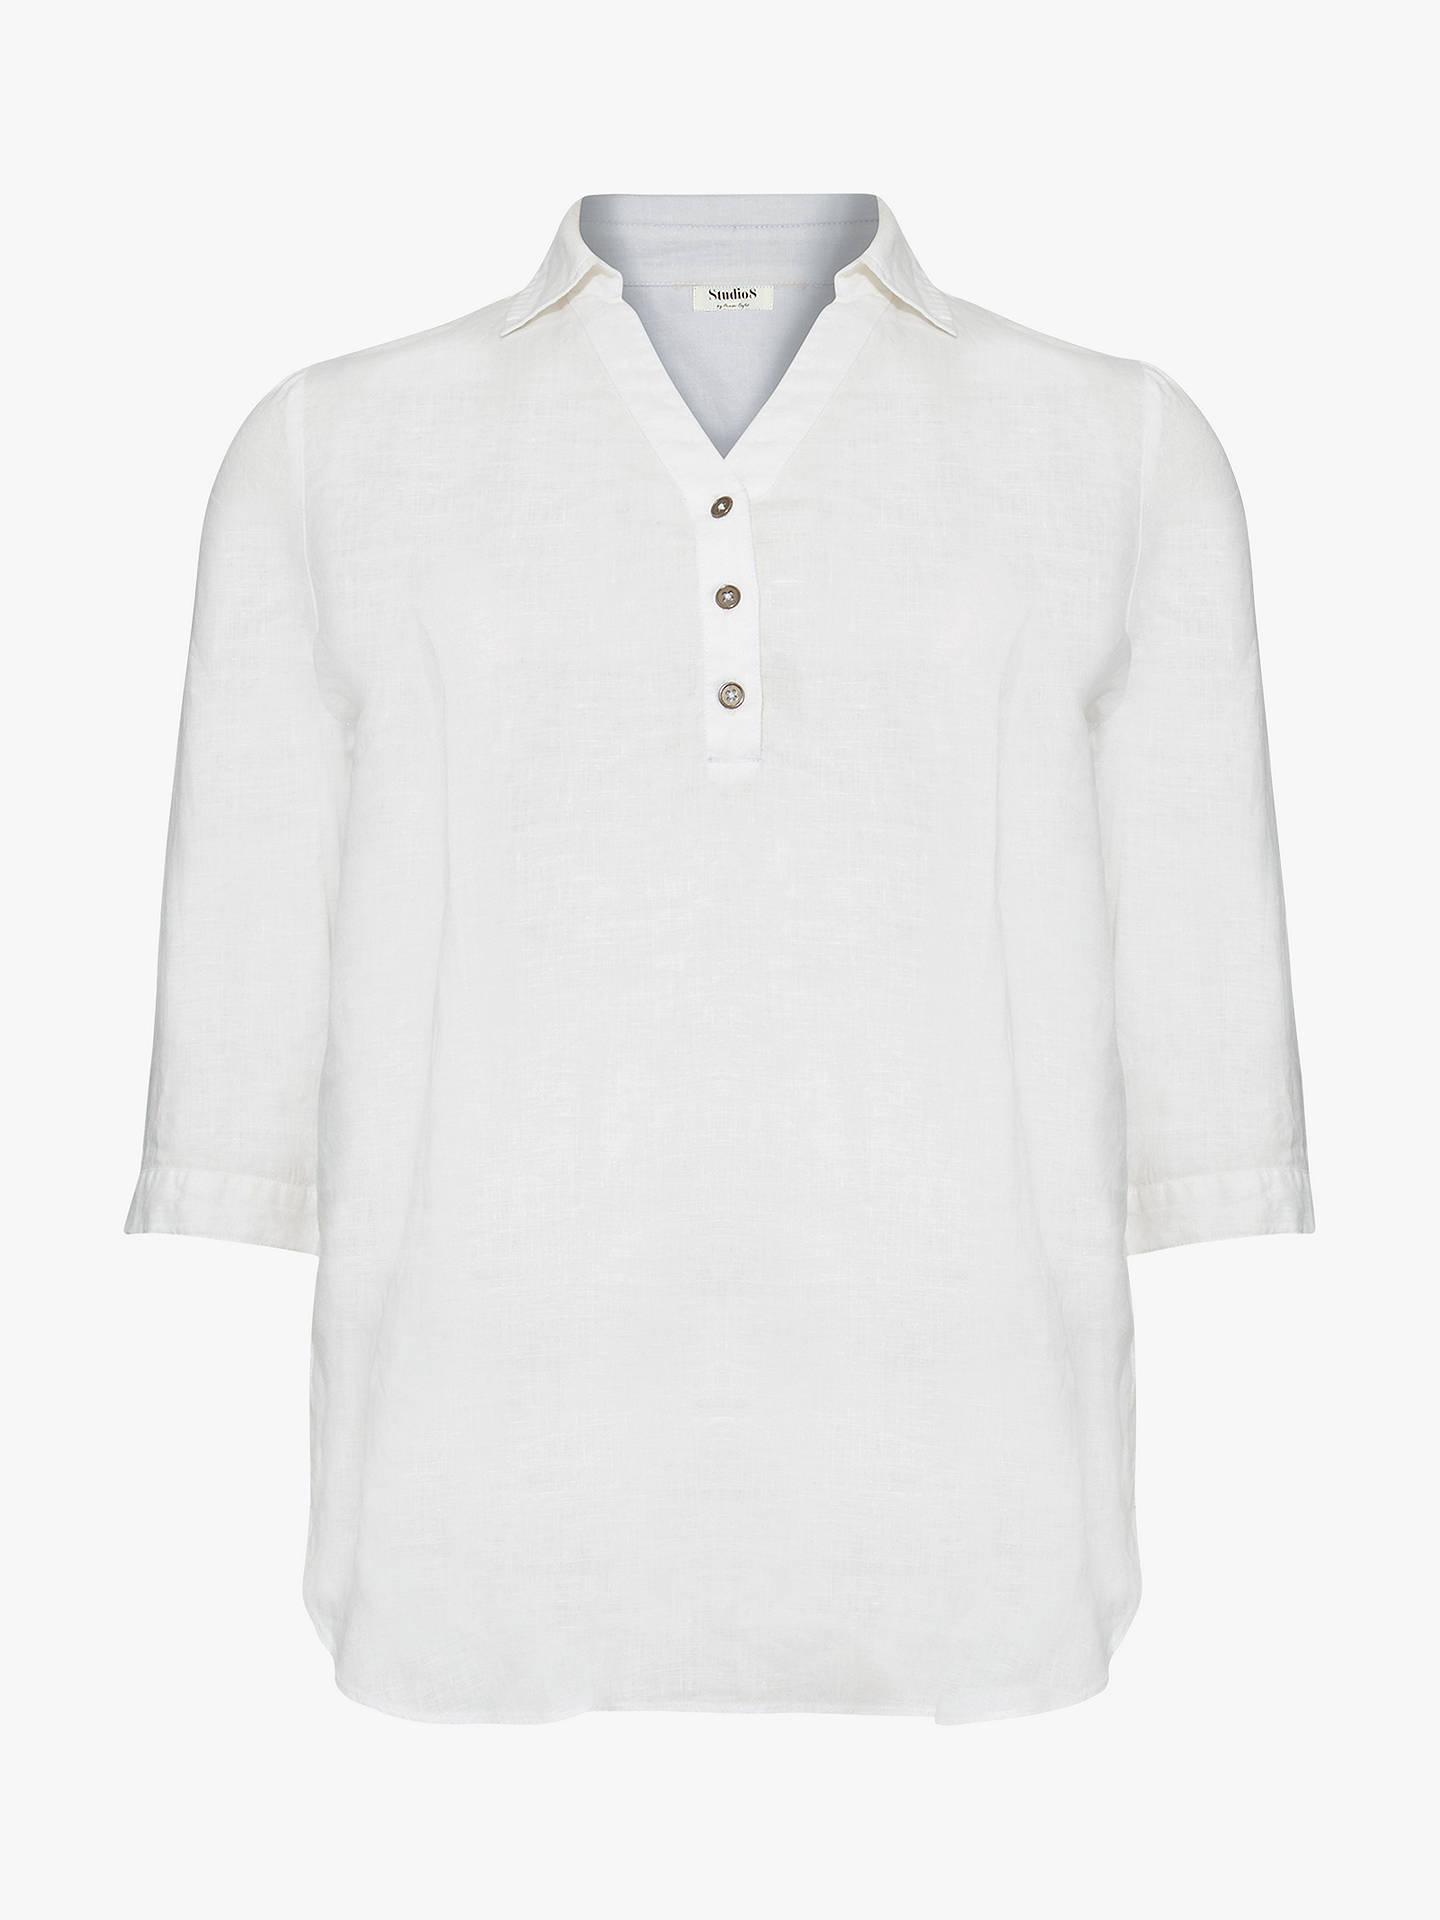 81996e2d ... Buy Studio 8 Haze Linen Shirt, White, 16 Online at johnlewis.com